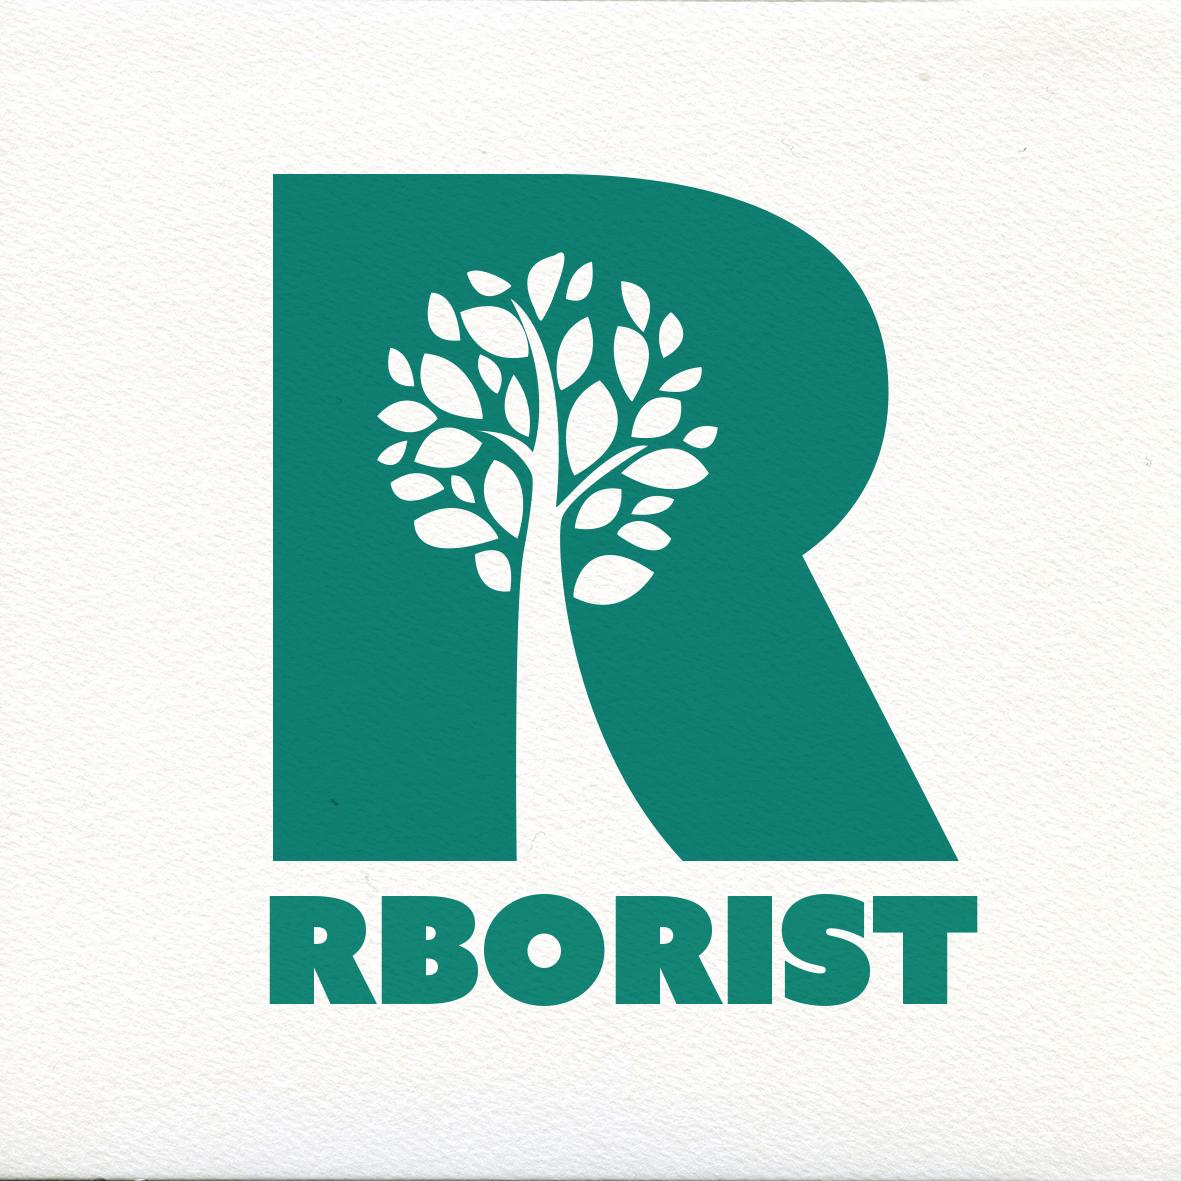 rborist logo